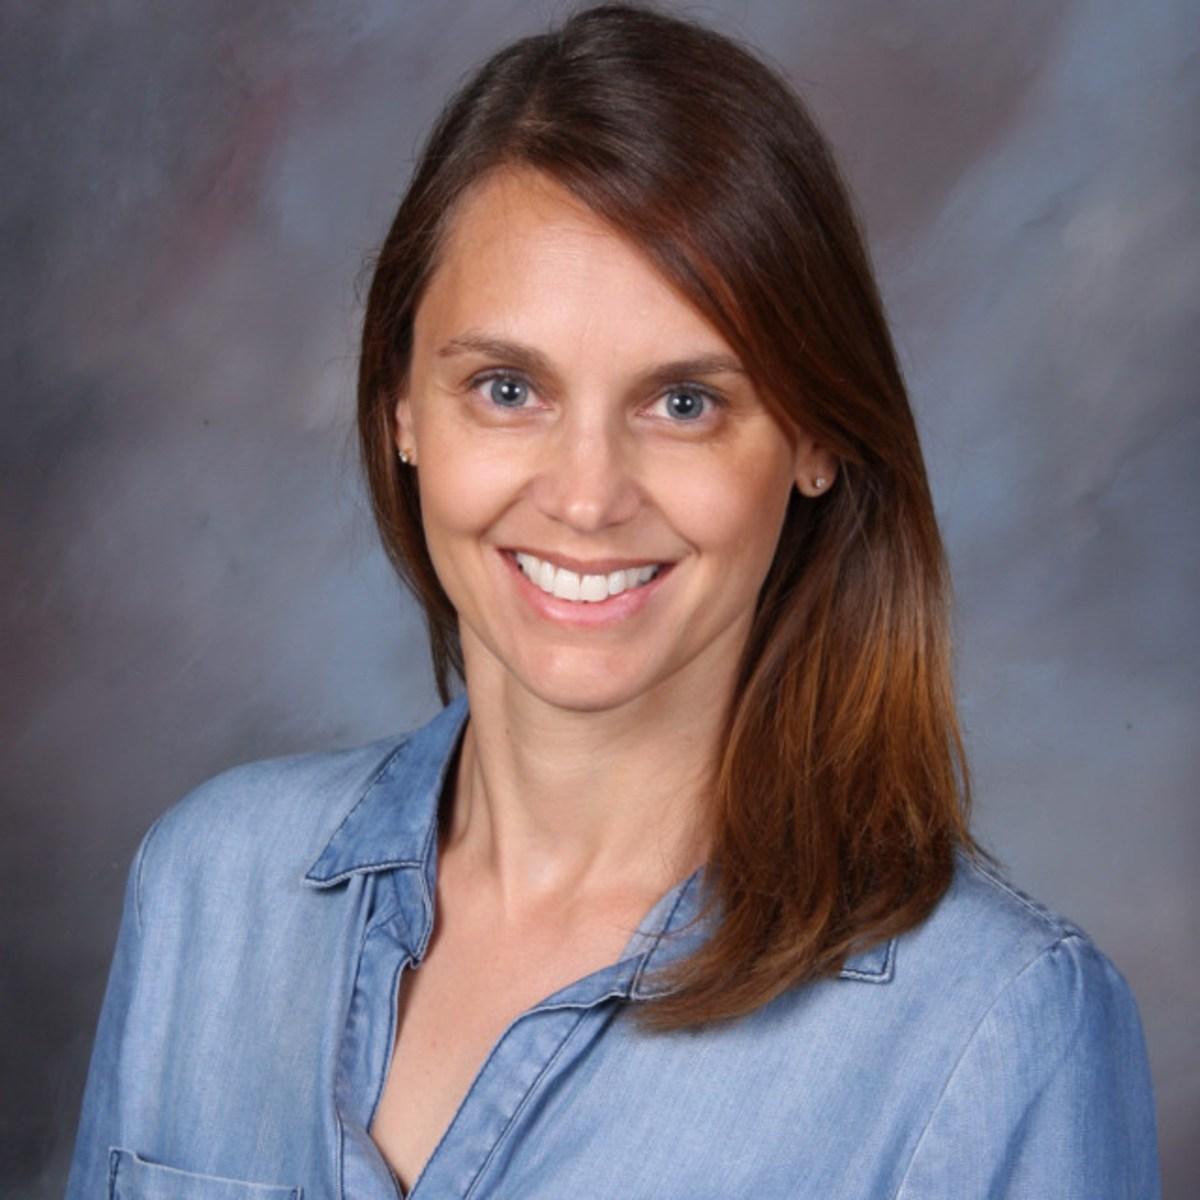 staff directory highland high school jenny agnew s profile photo